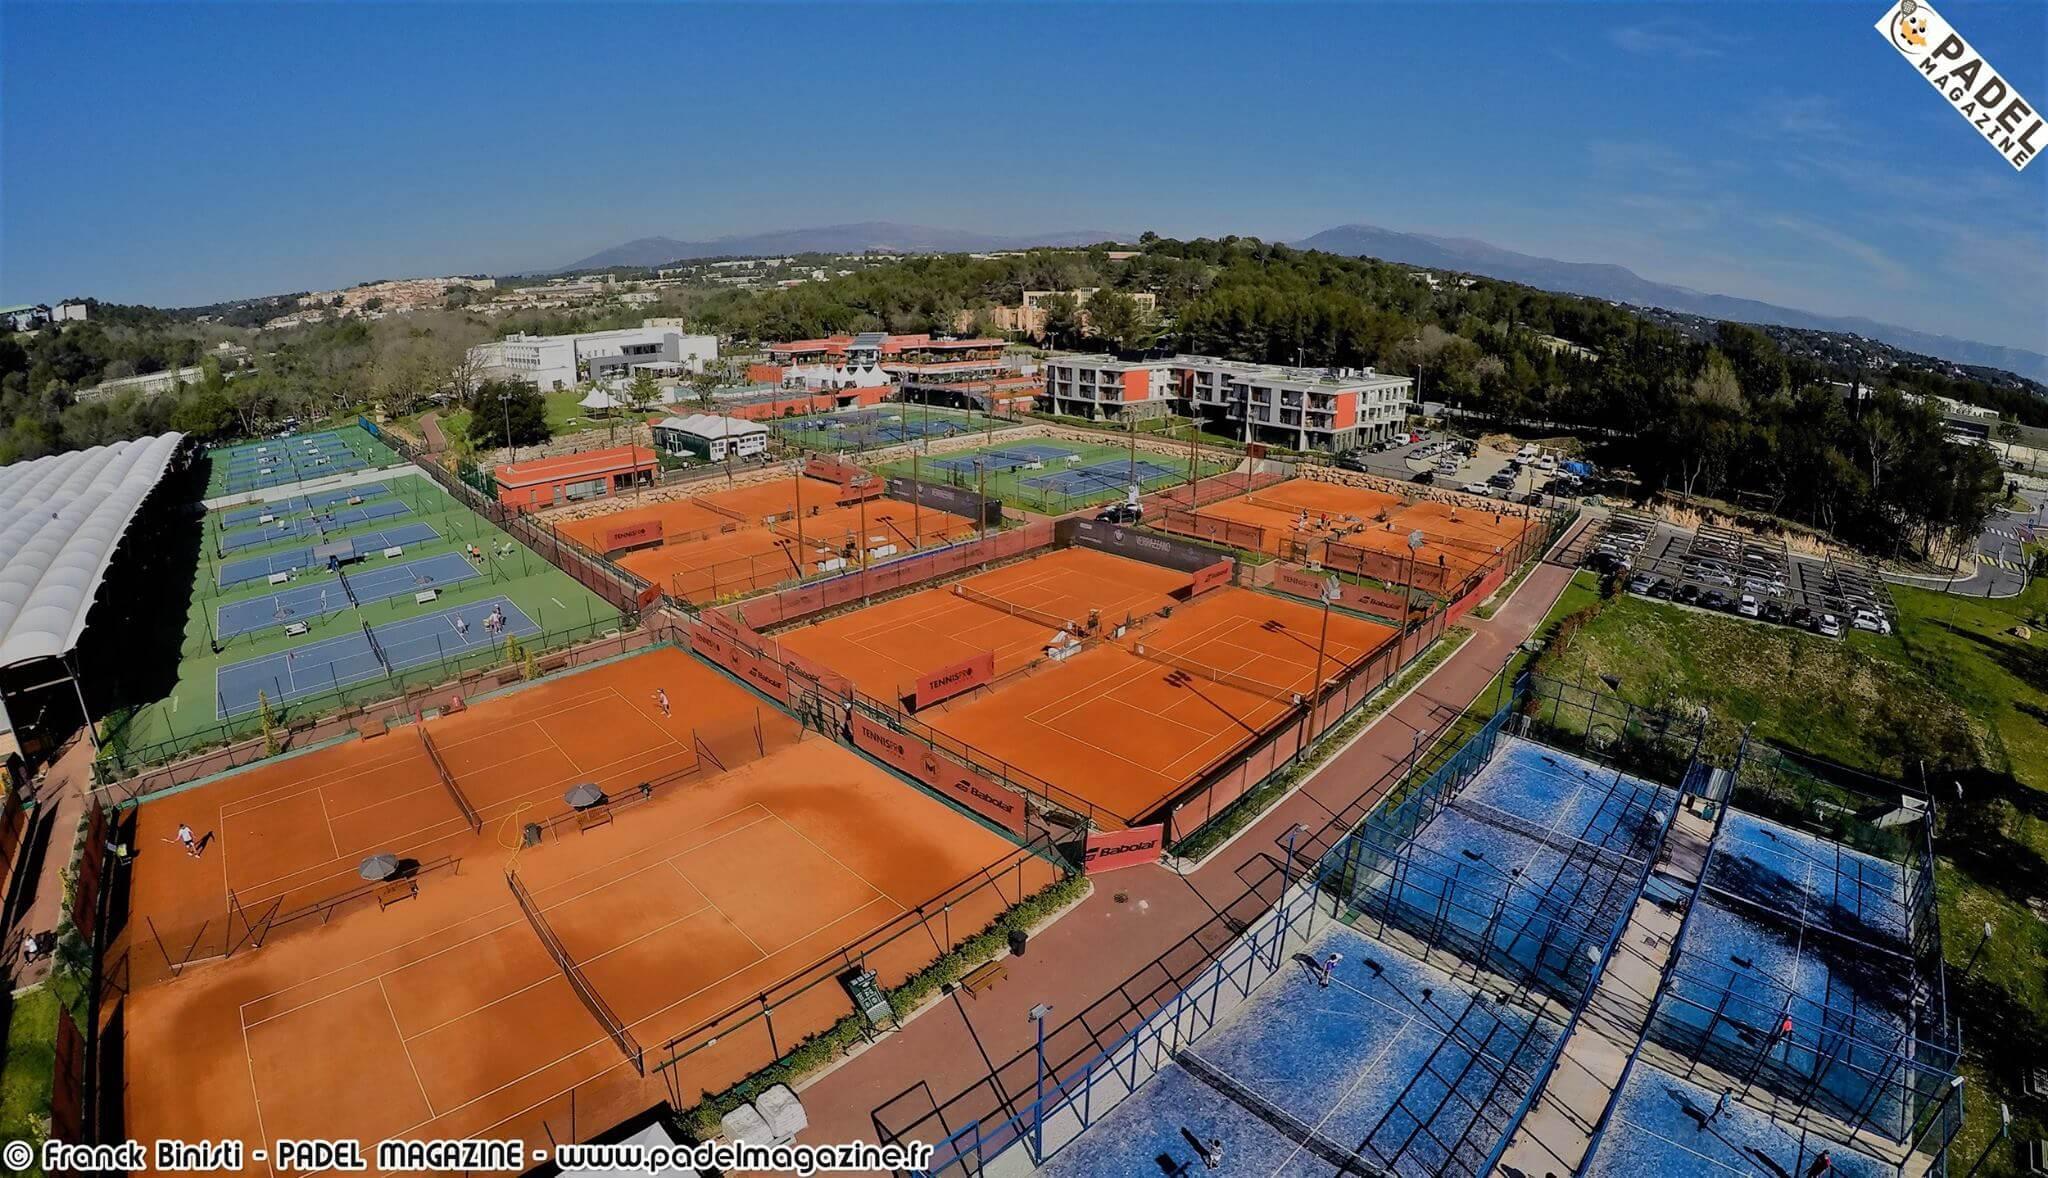 Vu du ciel du Real Padel Club / Mouratoglou Academy